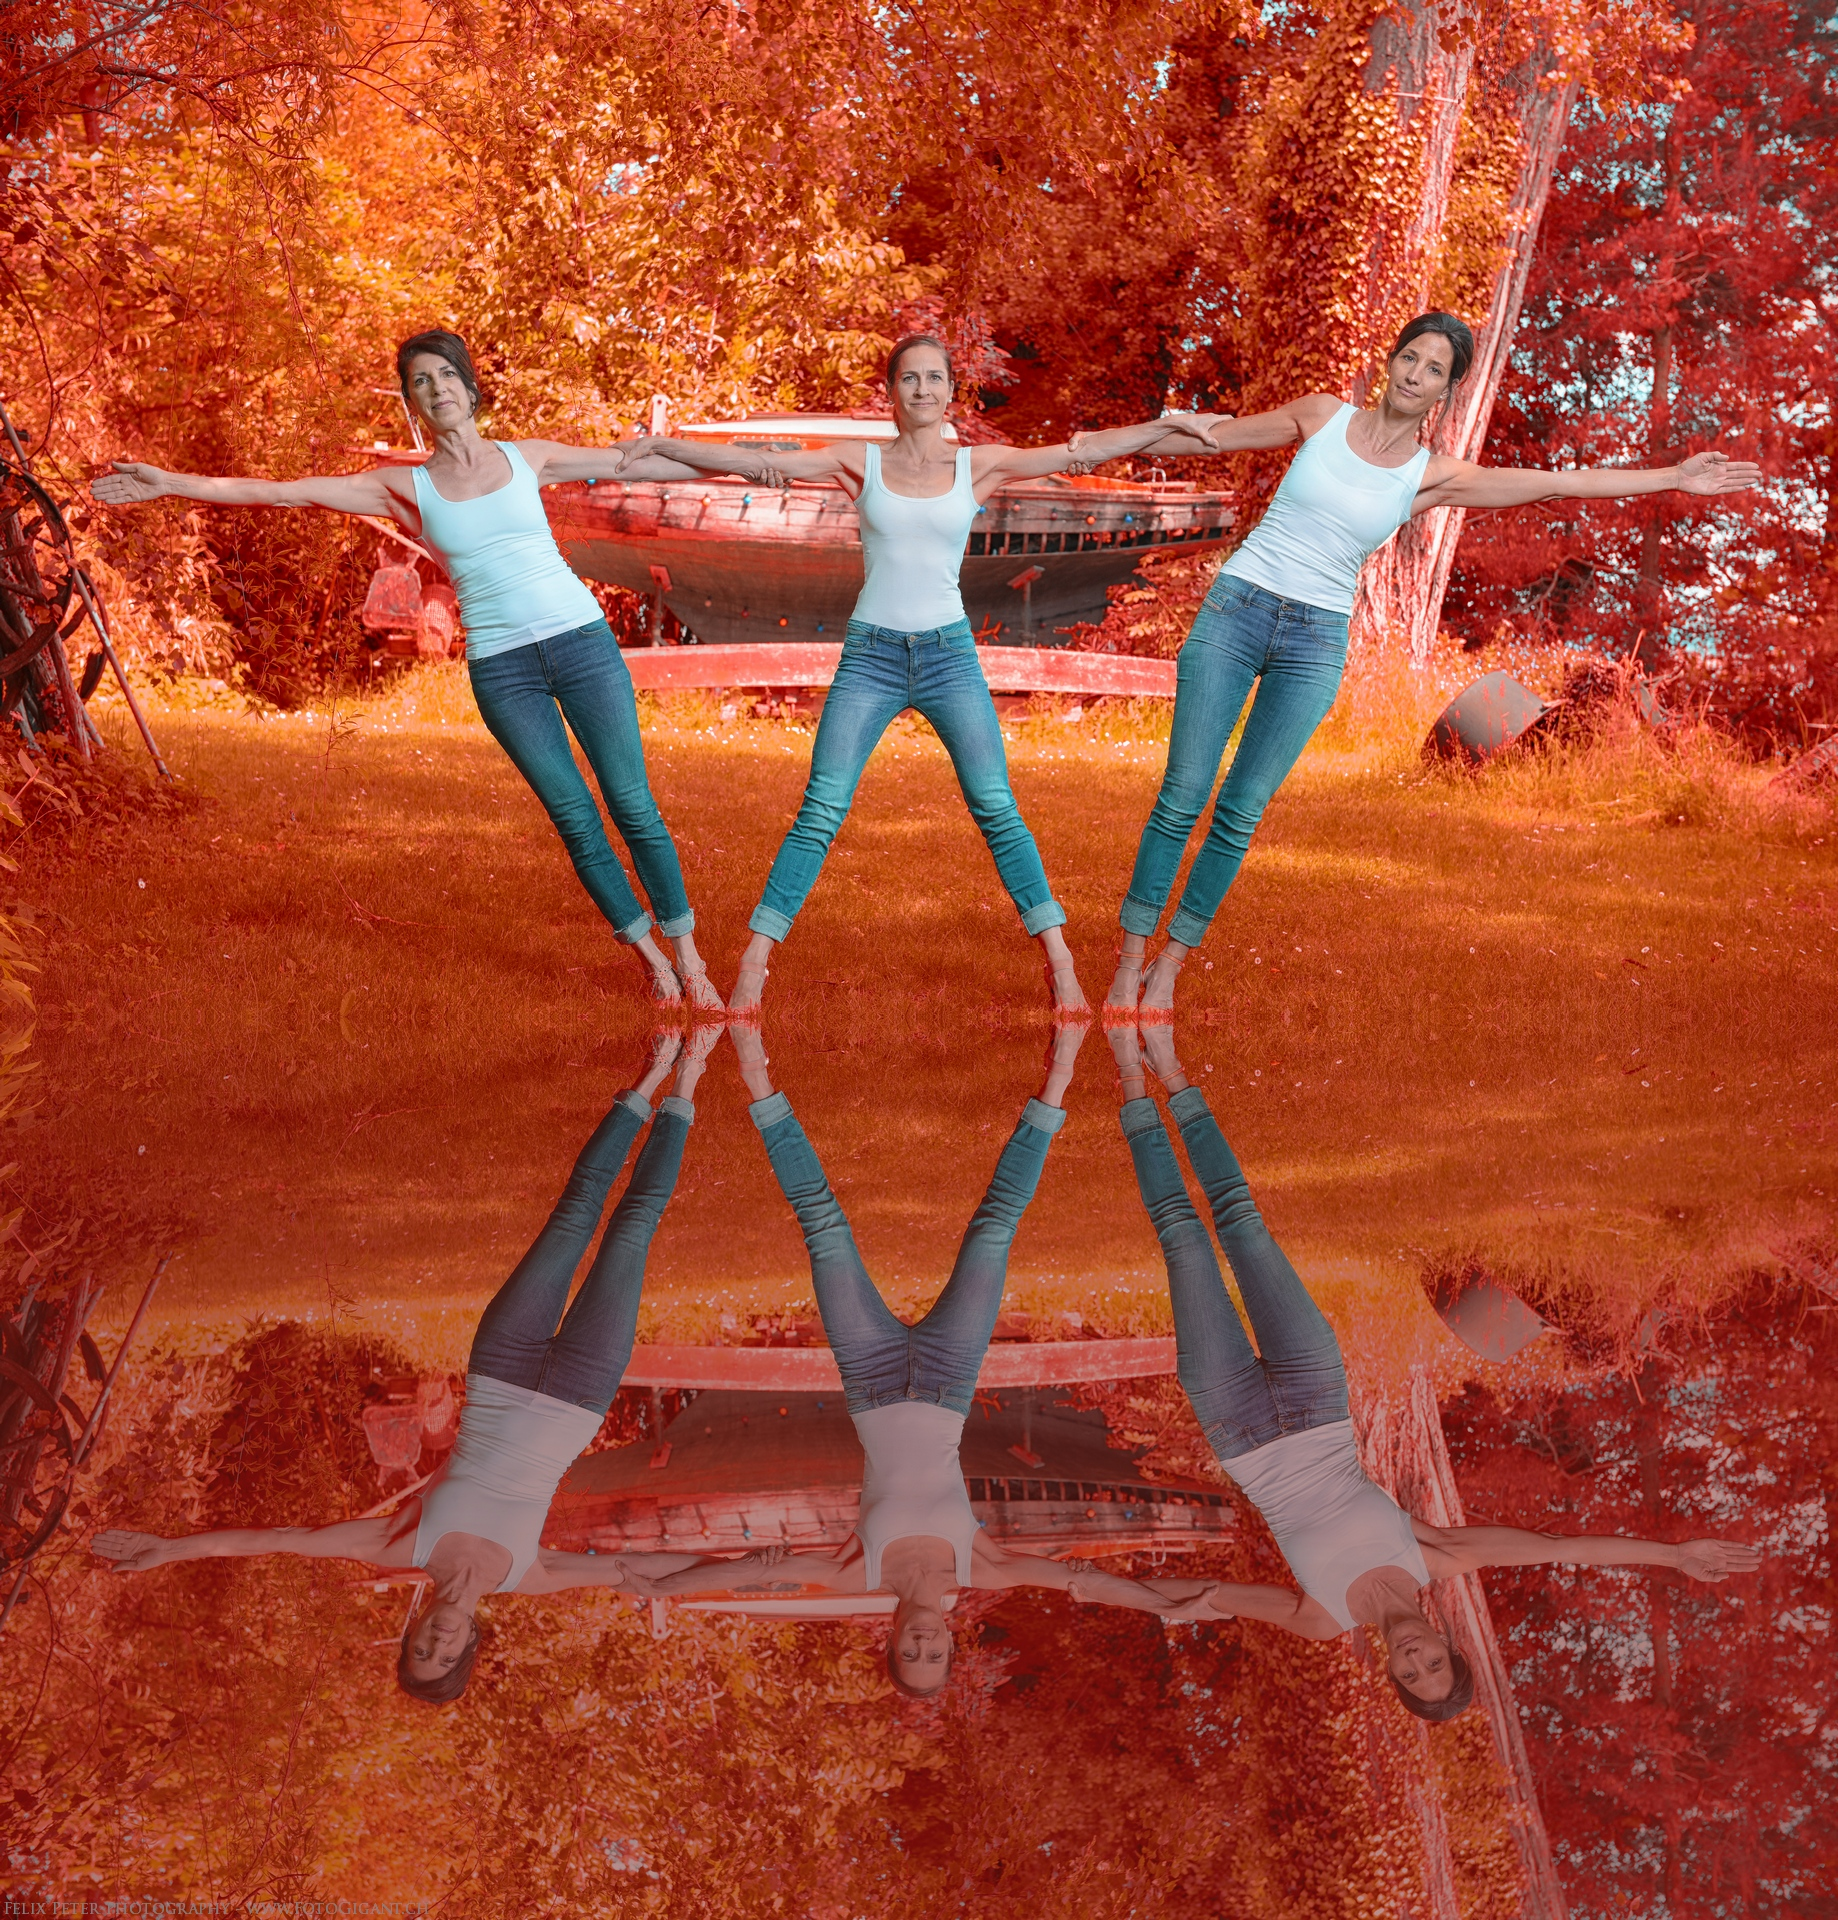 Felix-Peter-Yoga-Pilates-Dance-Fotografie_Bern_041.jpg